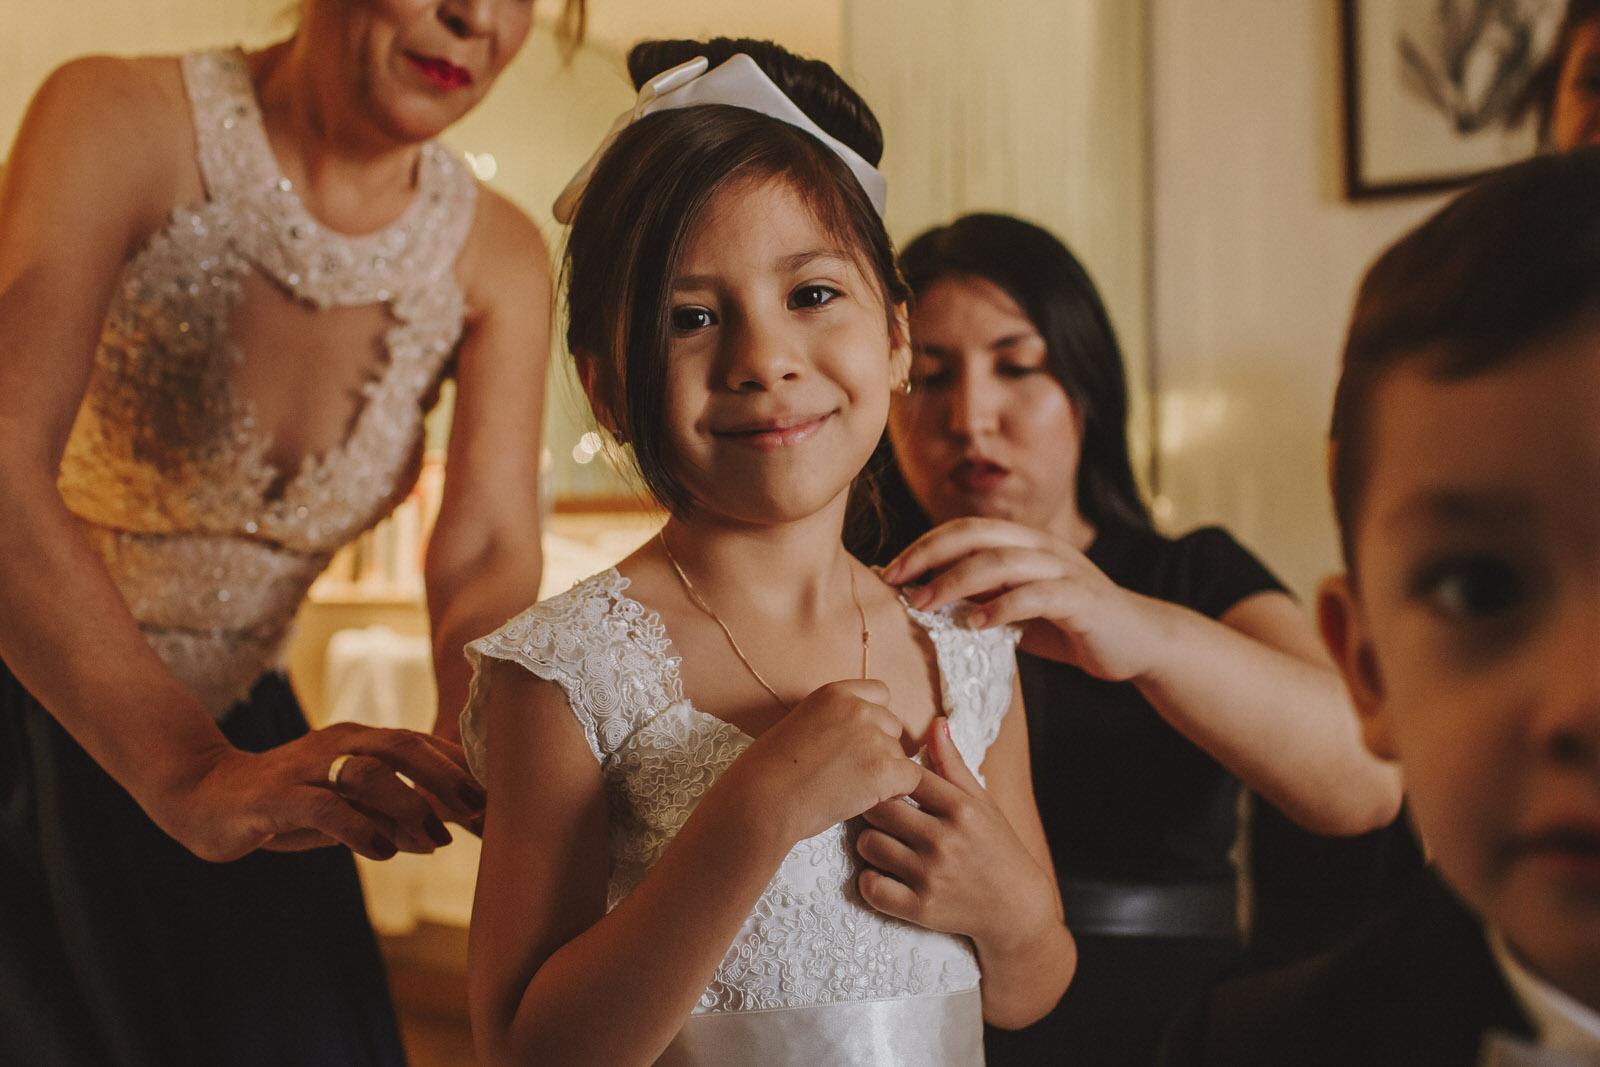 sobrina de la novia siendo arreglada en el hotel sheraton lima